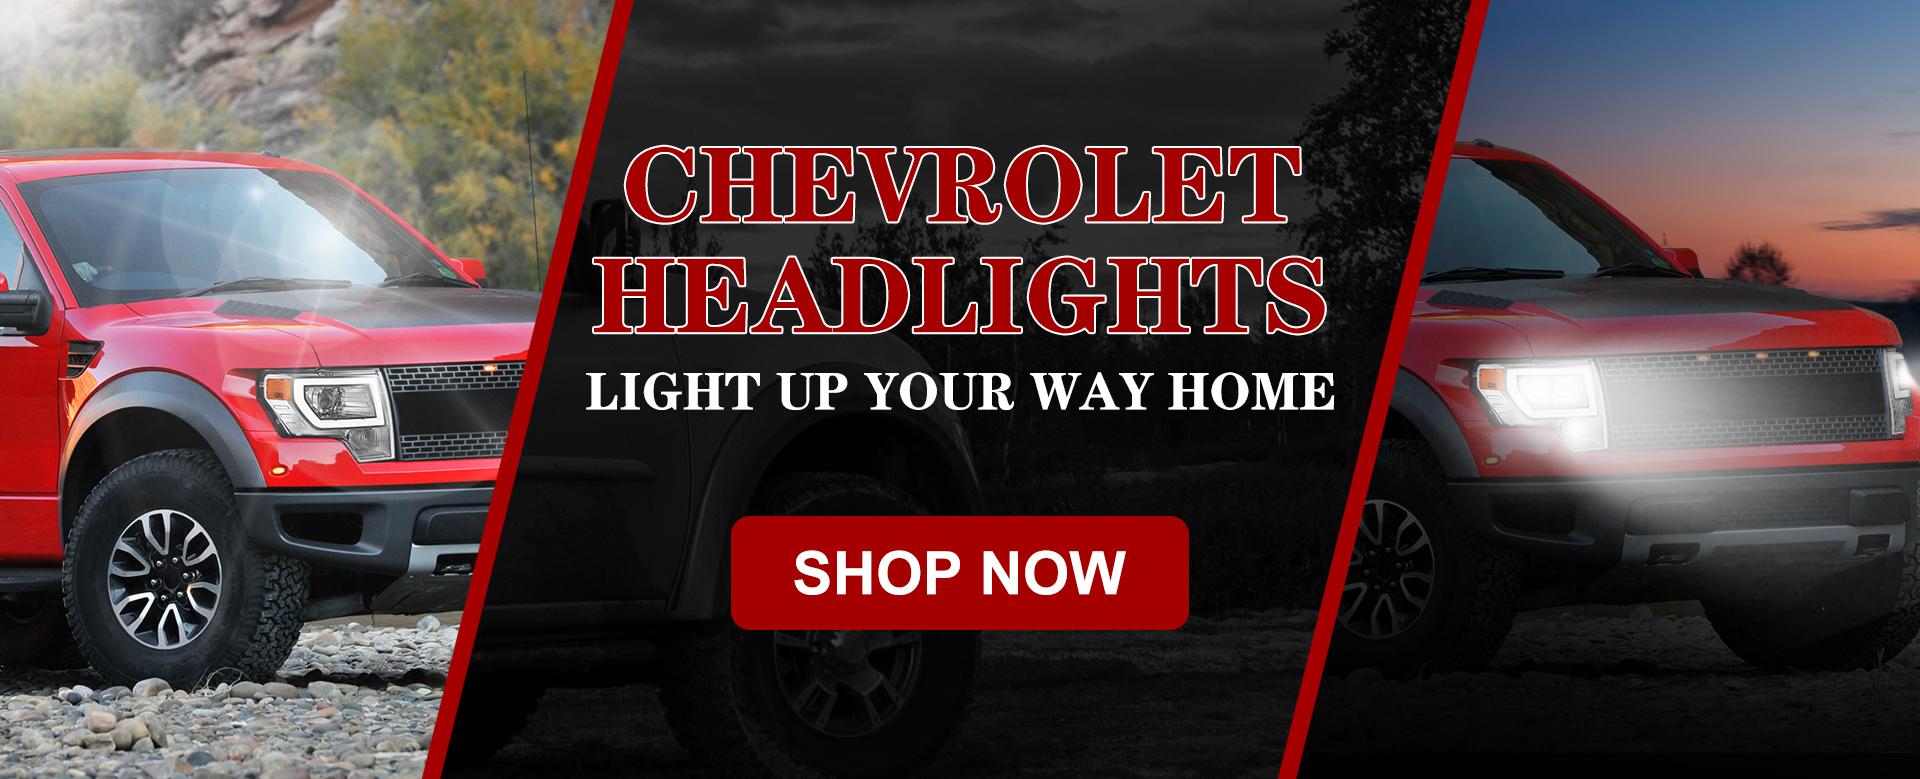 Chevrolet Headlight Sale